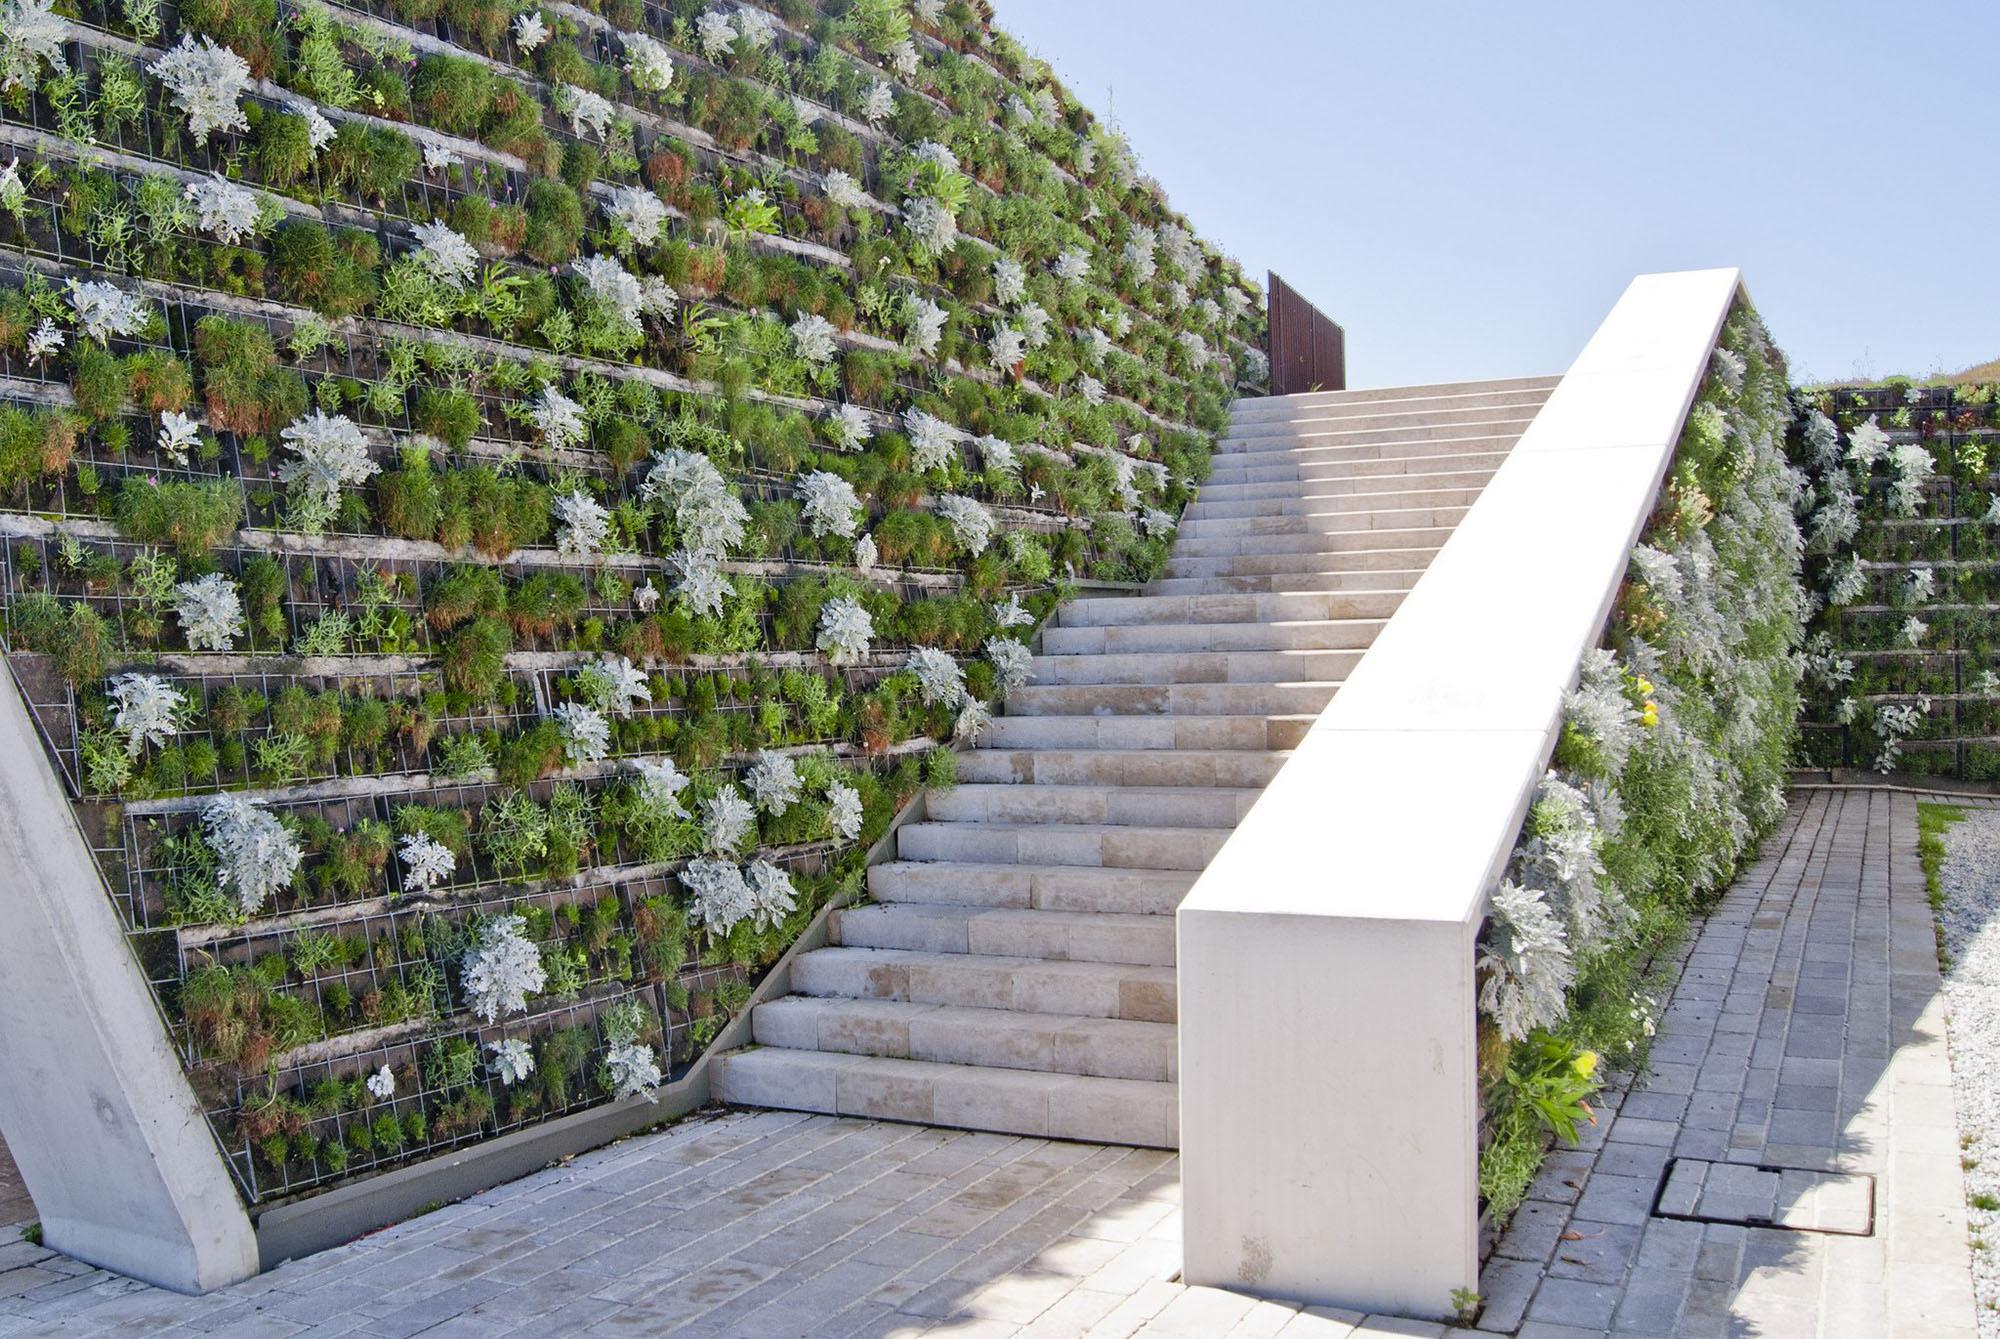 Living green walls surround concrete steps.